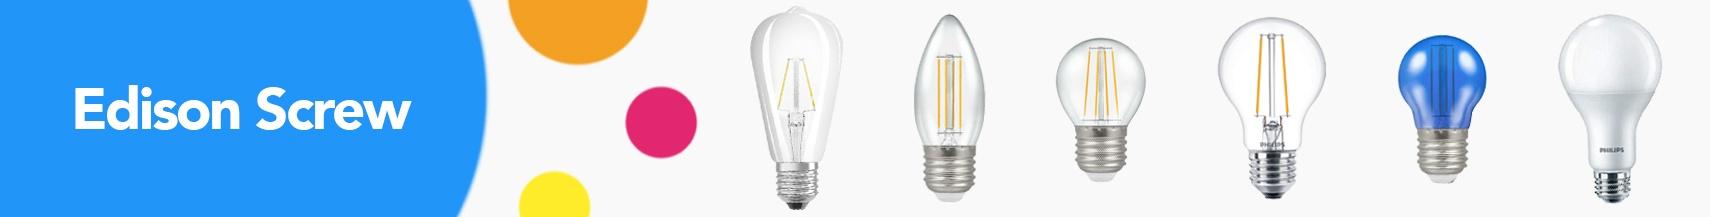 edison_screw_bulbs